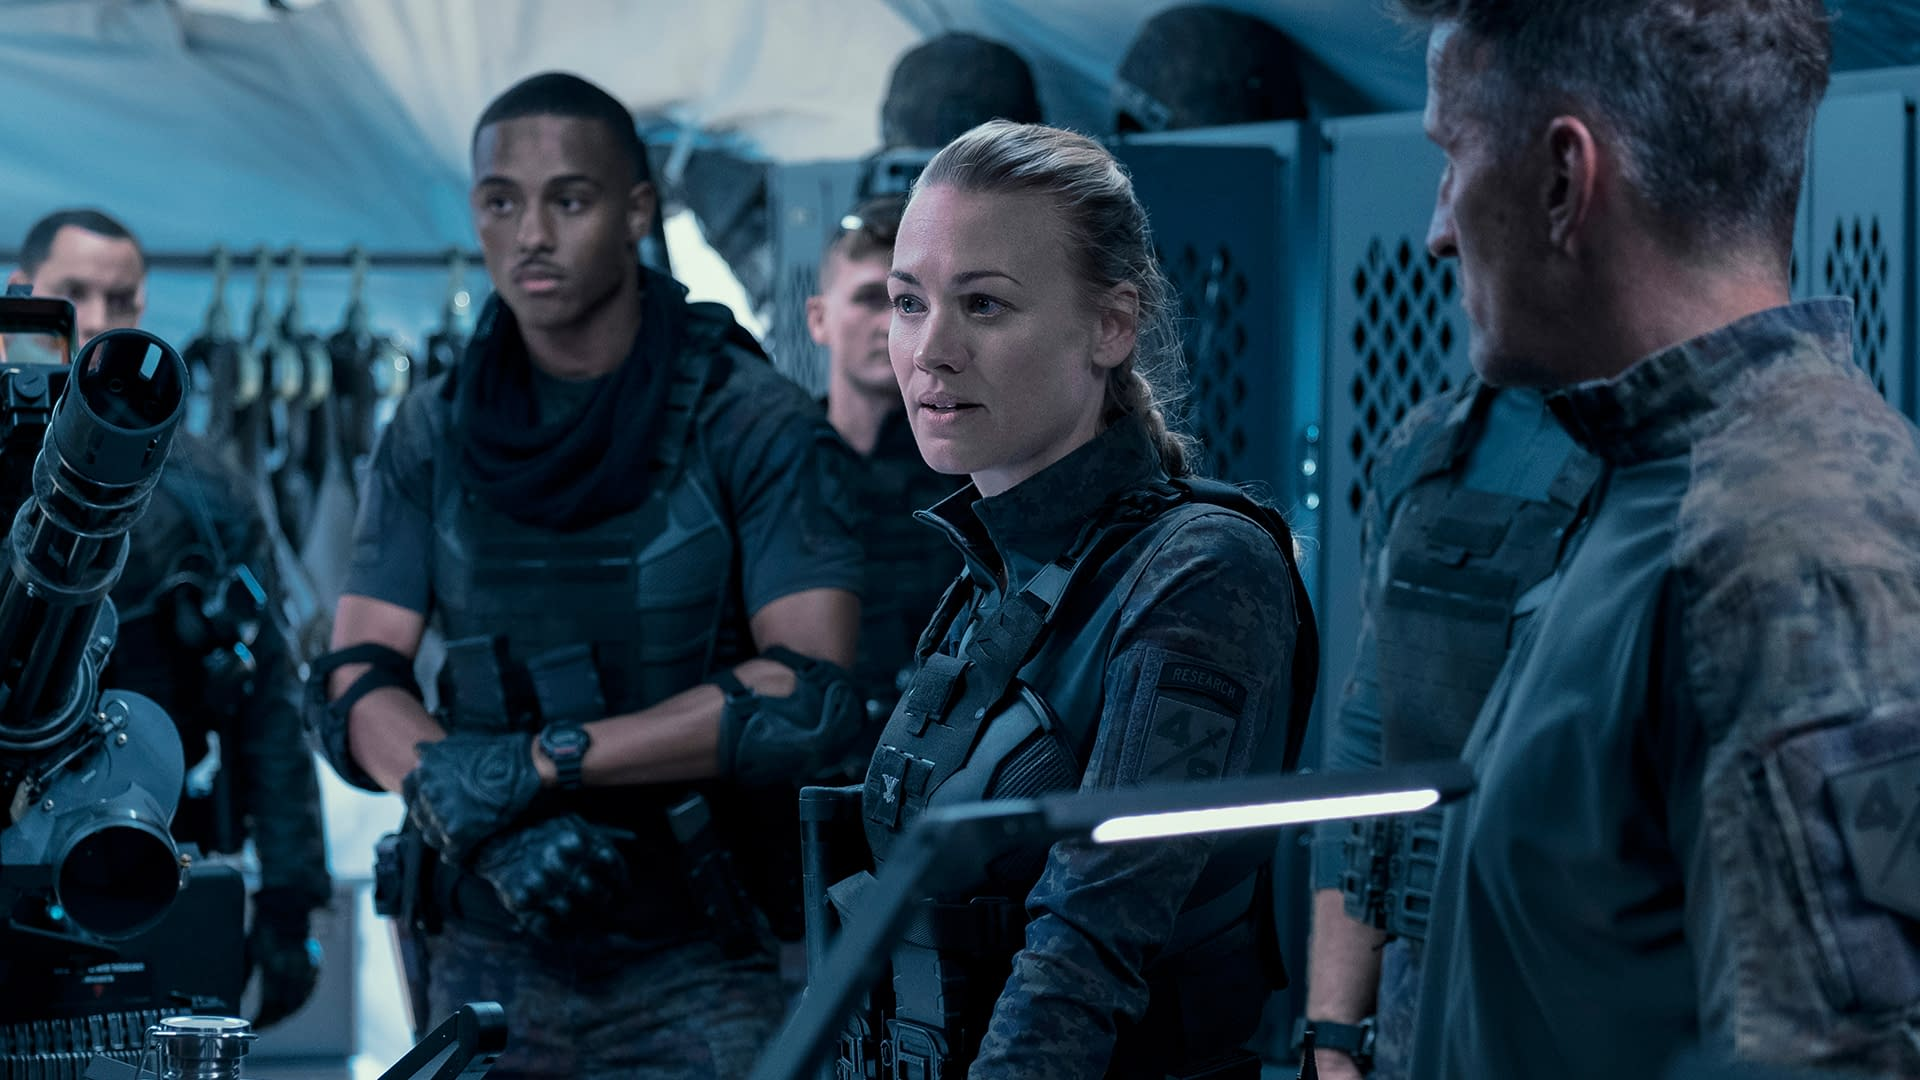 Amazon Posts First Teaser For Chris Pratt's The Tomorrow War